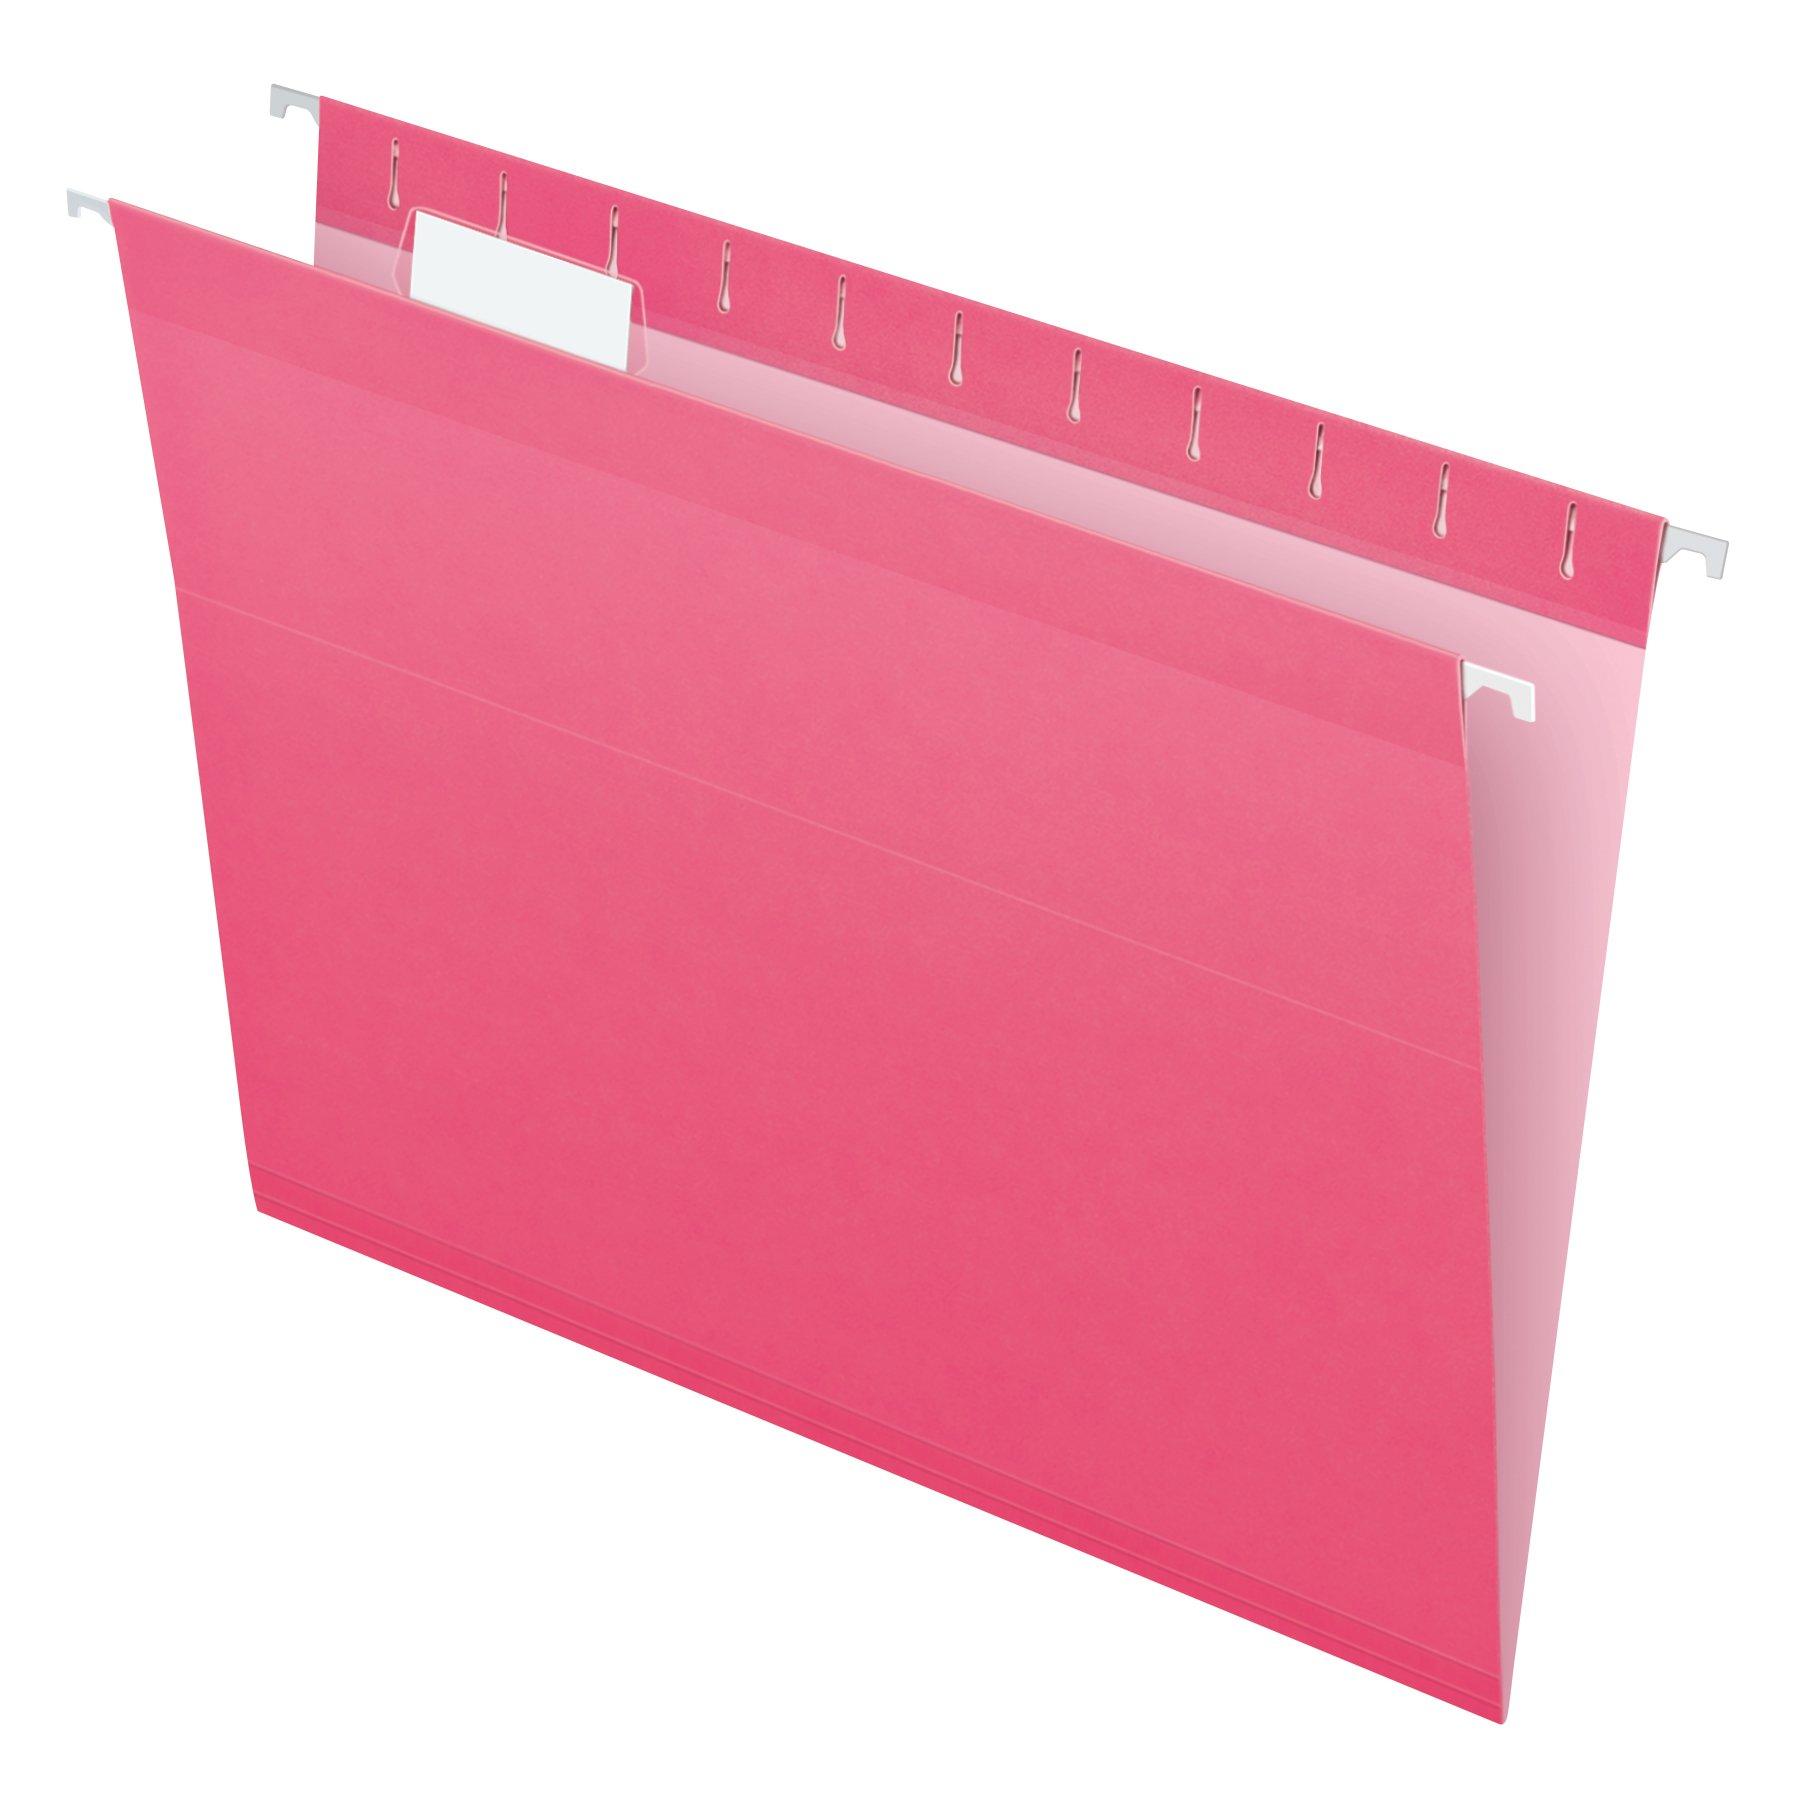 Pendaflex Reinforced Hanging File Folders, Letter Size, Pink, 1/5 Cut, 25/BX (4152 1/5 PIN)